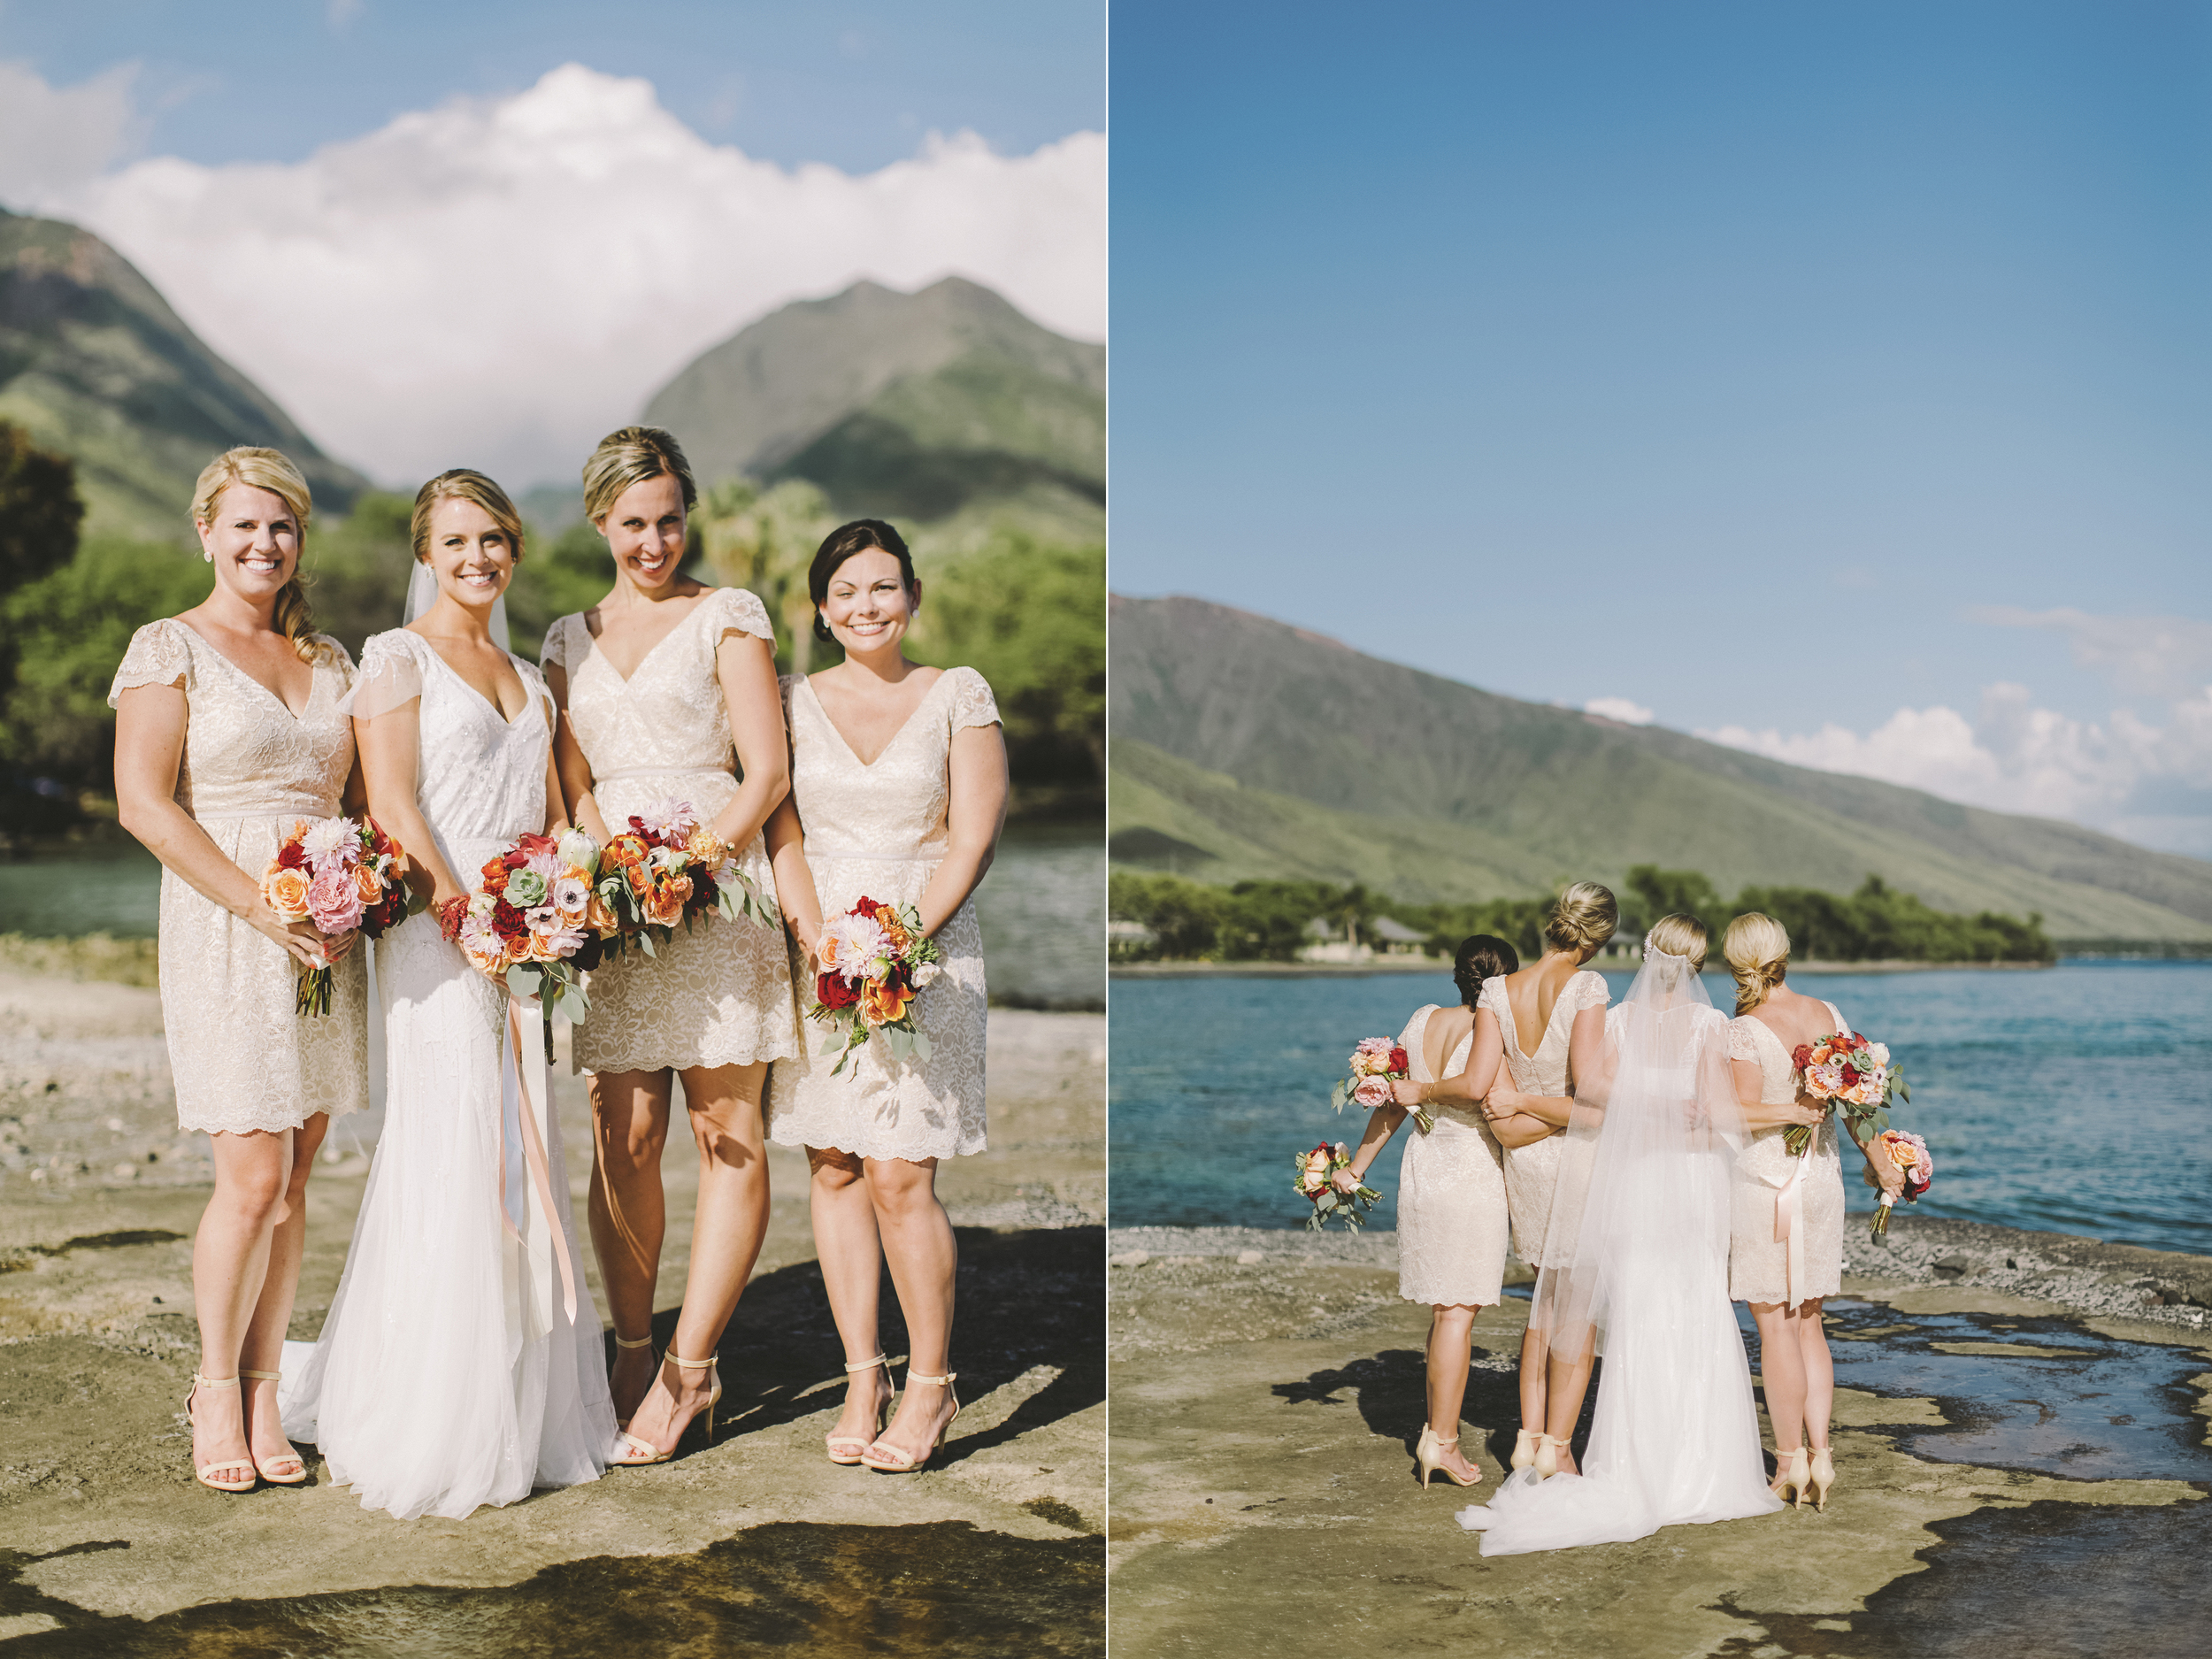 angie-diaz-photography-maui-wedding-mel-matt-64.jpg